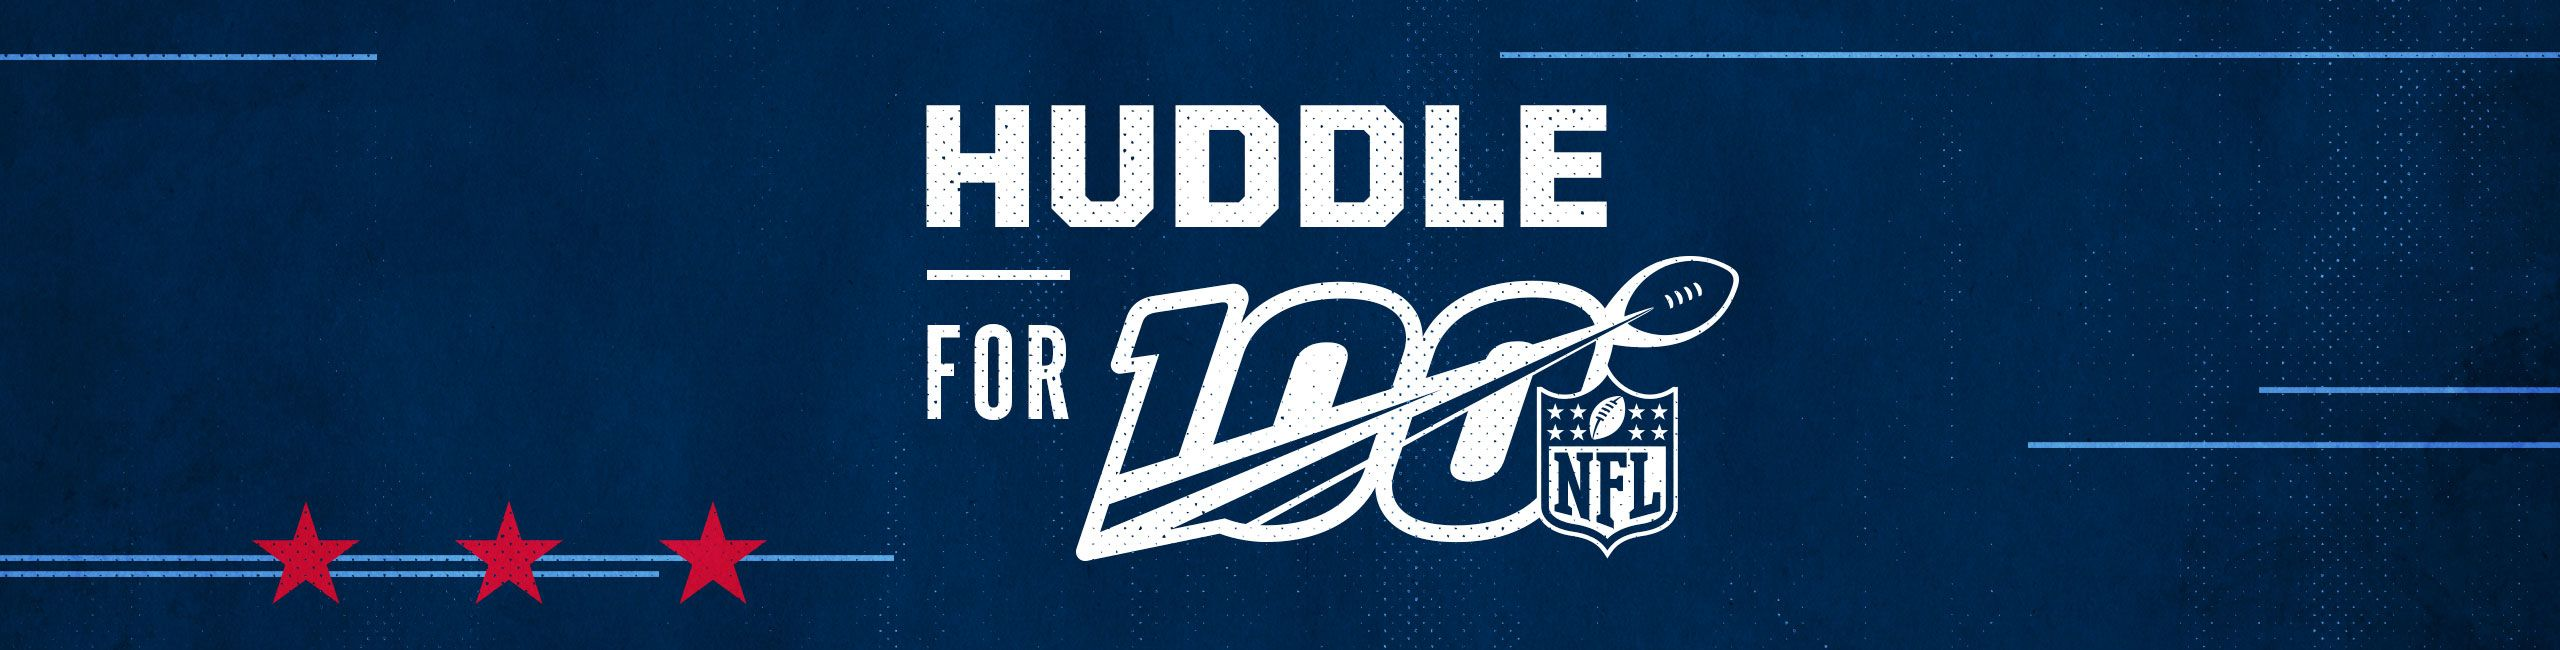 2019-titans-huddle-for-100-hdr